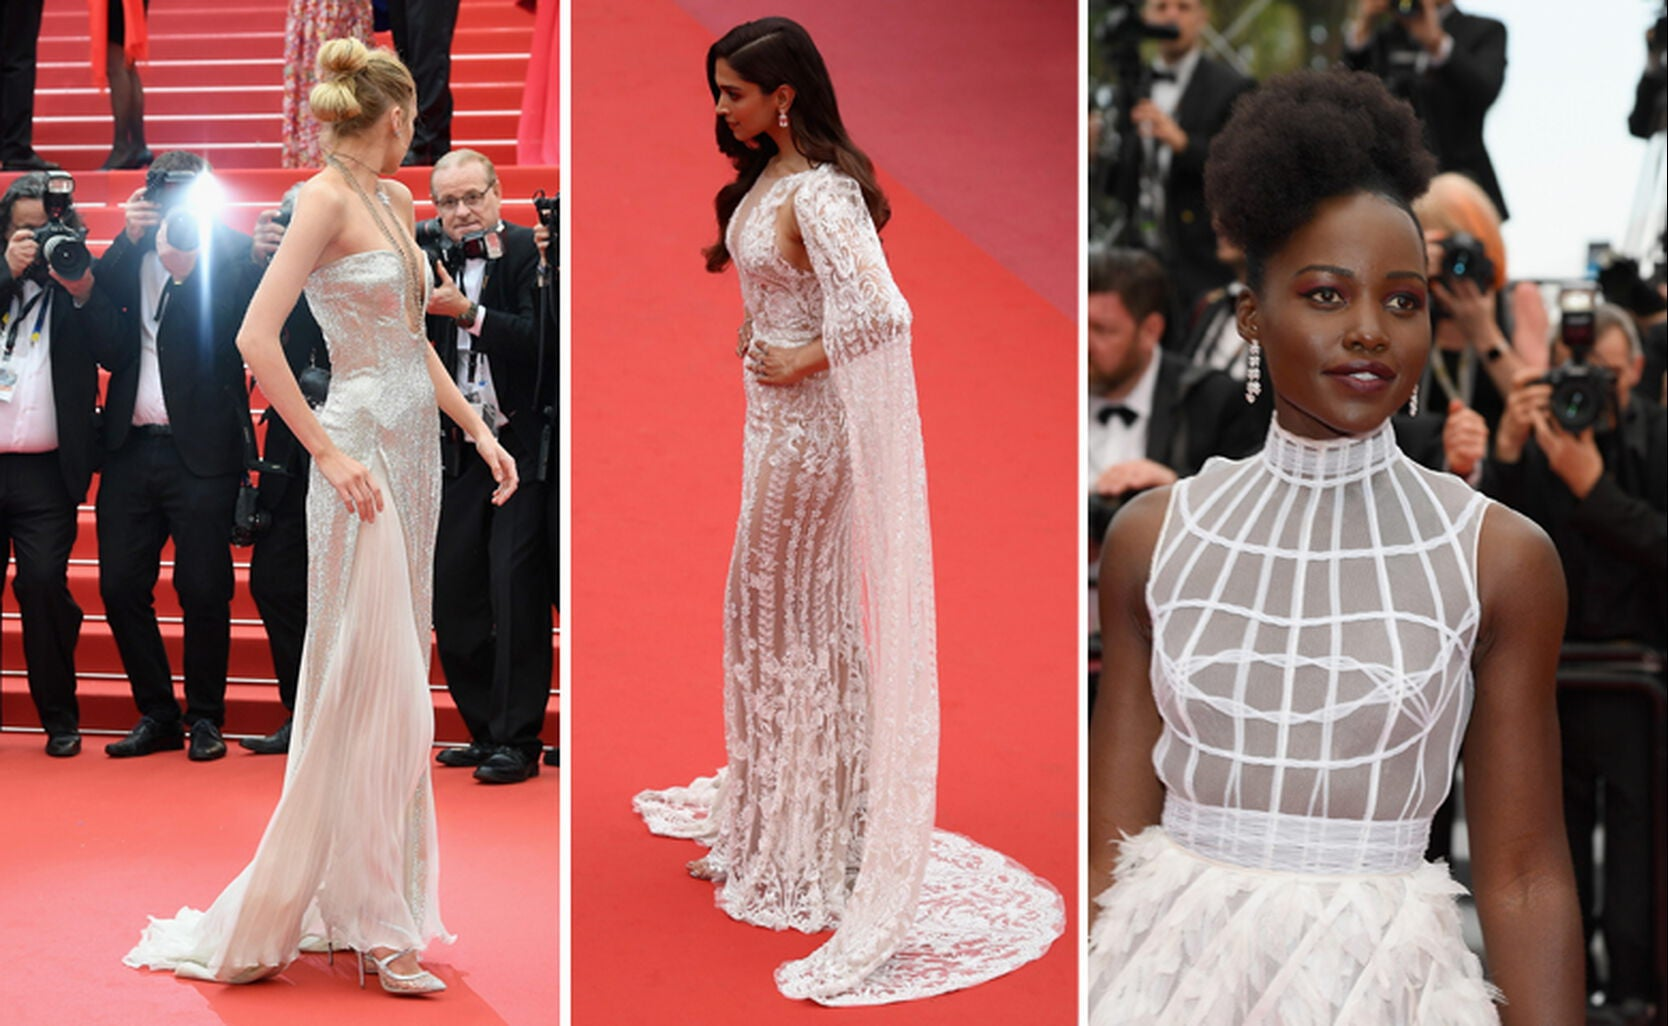 Stella Maxwell, Deepika Padukone and Lupita Nyong'o